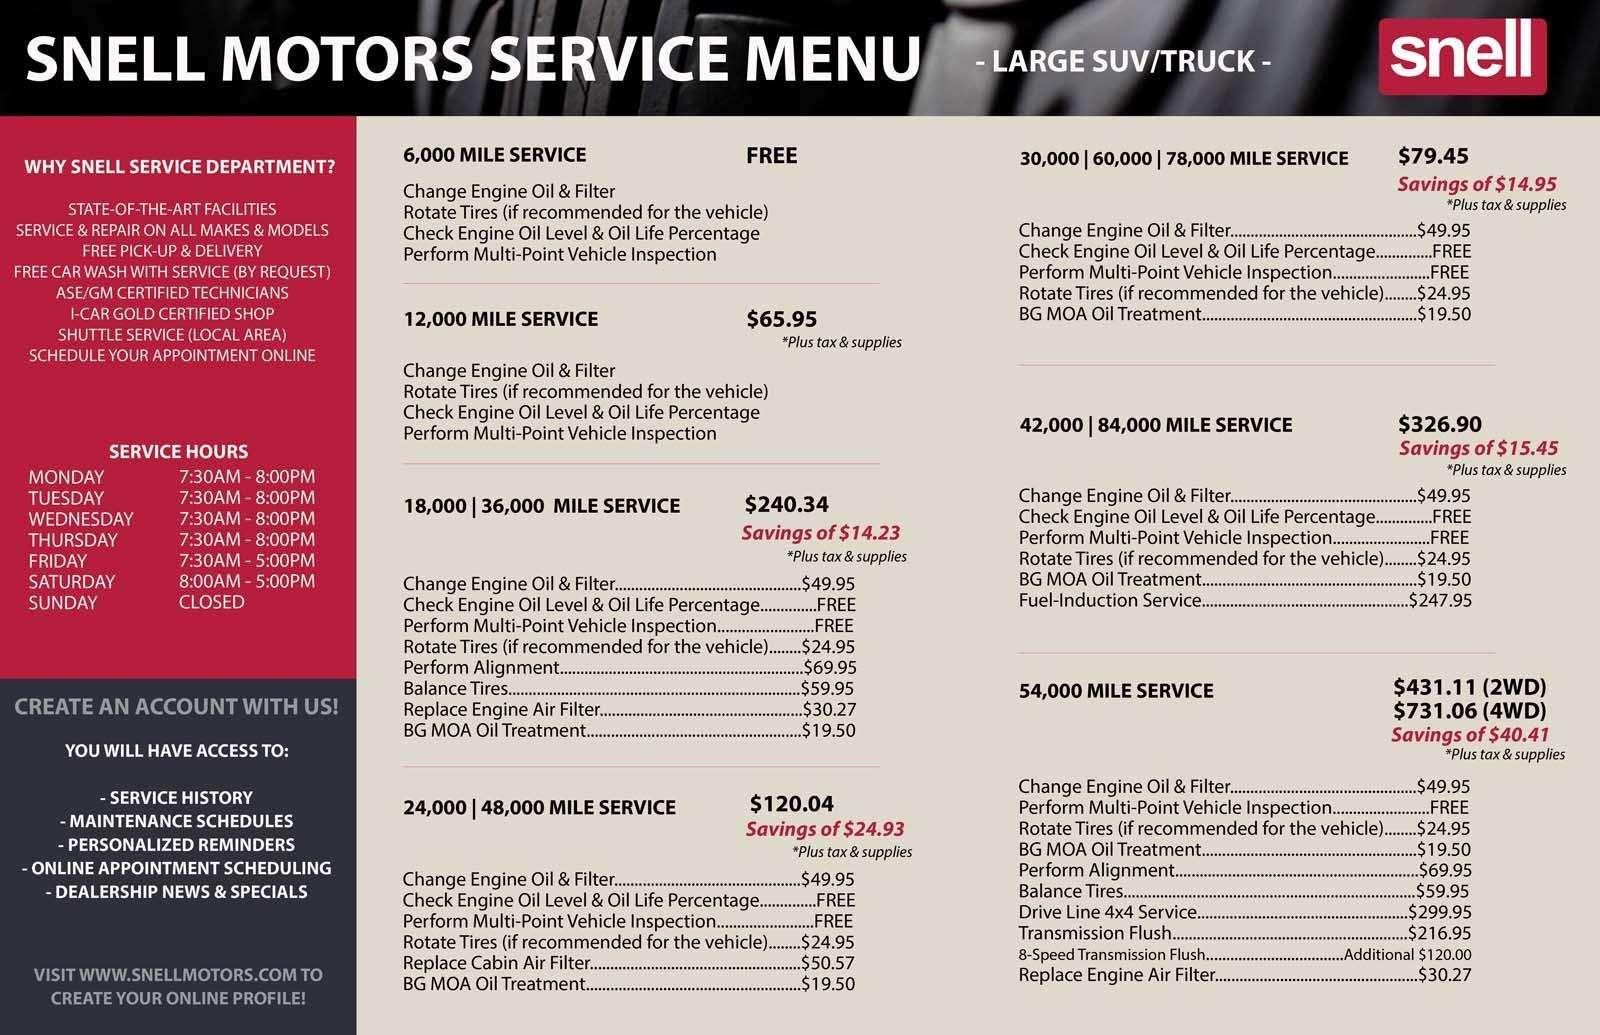 Large SUVs and Trucks Service Menu